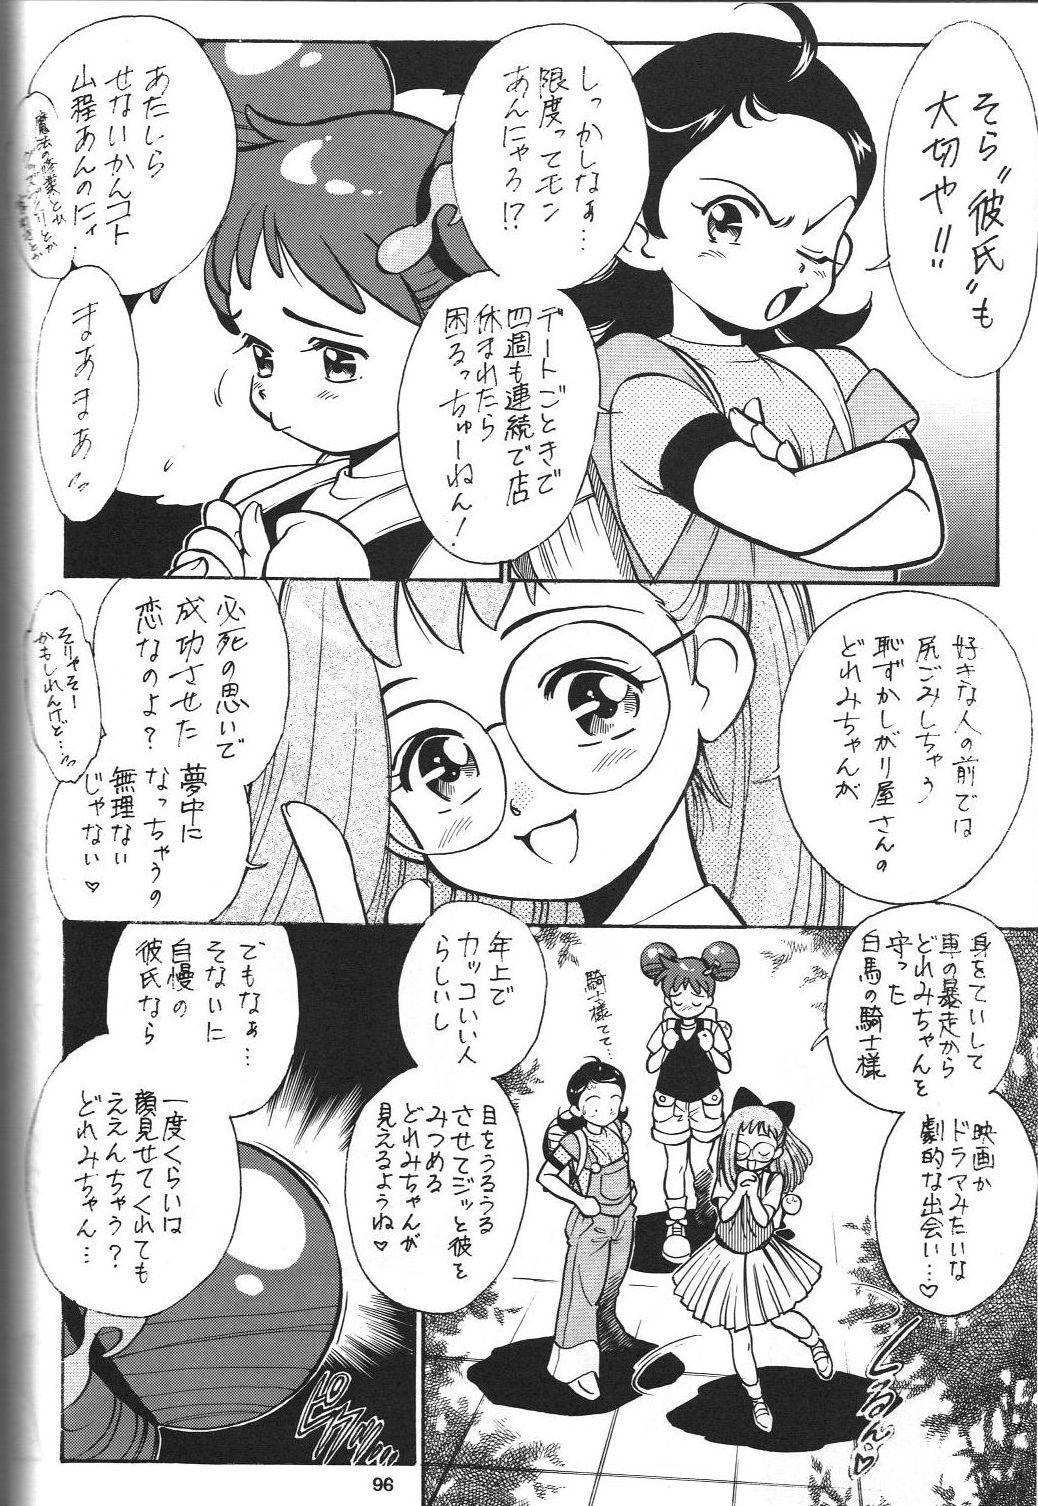 (C56) [Tsurikichi Doumei (Various)] Sengoku Rock - Nan Demo-R (Various) 96